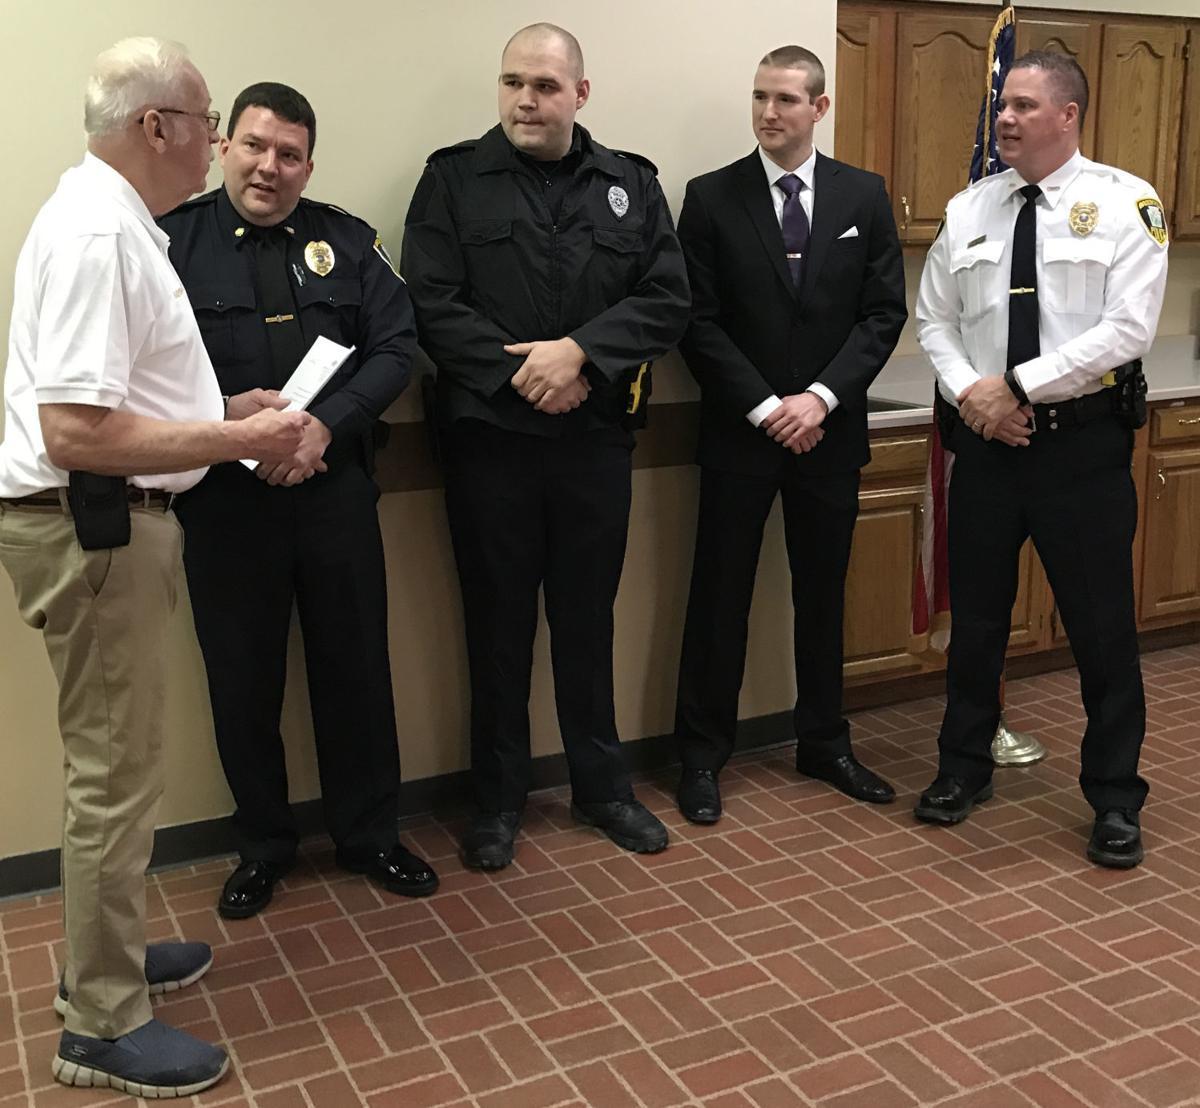 Police officers sworn in